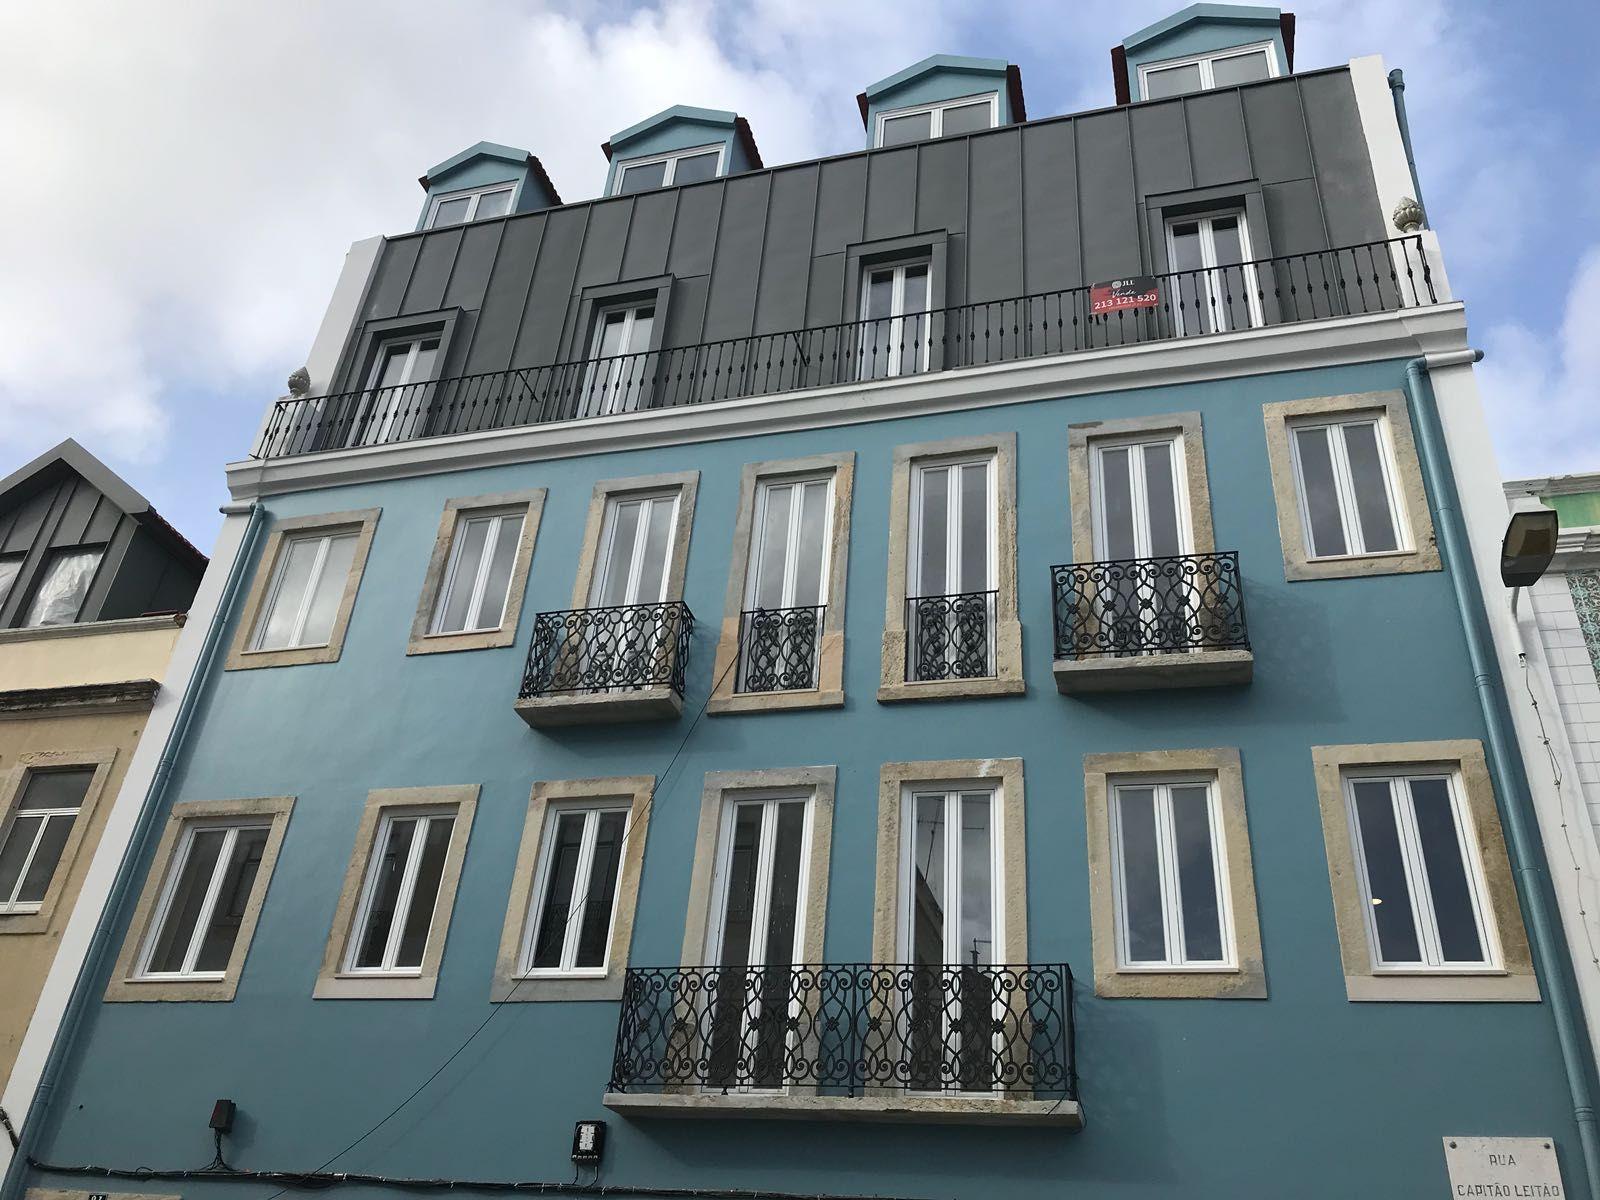 Diogo Neto Re Max Latina Ii Arroios Lisboa Portugal Vender Casa Lisboa Portugal Consultor Imobiliario